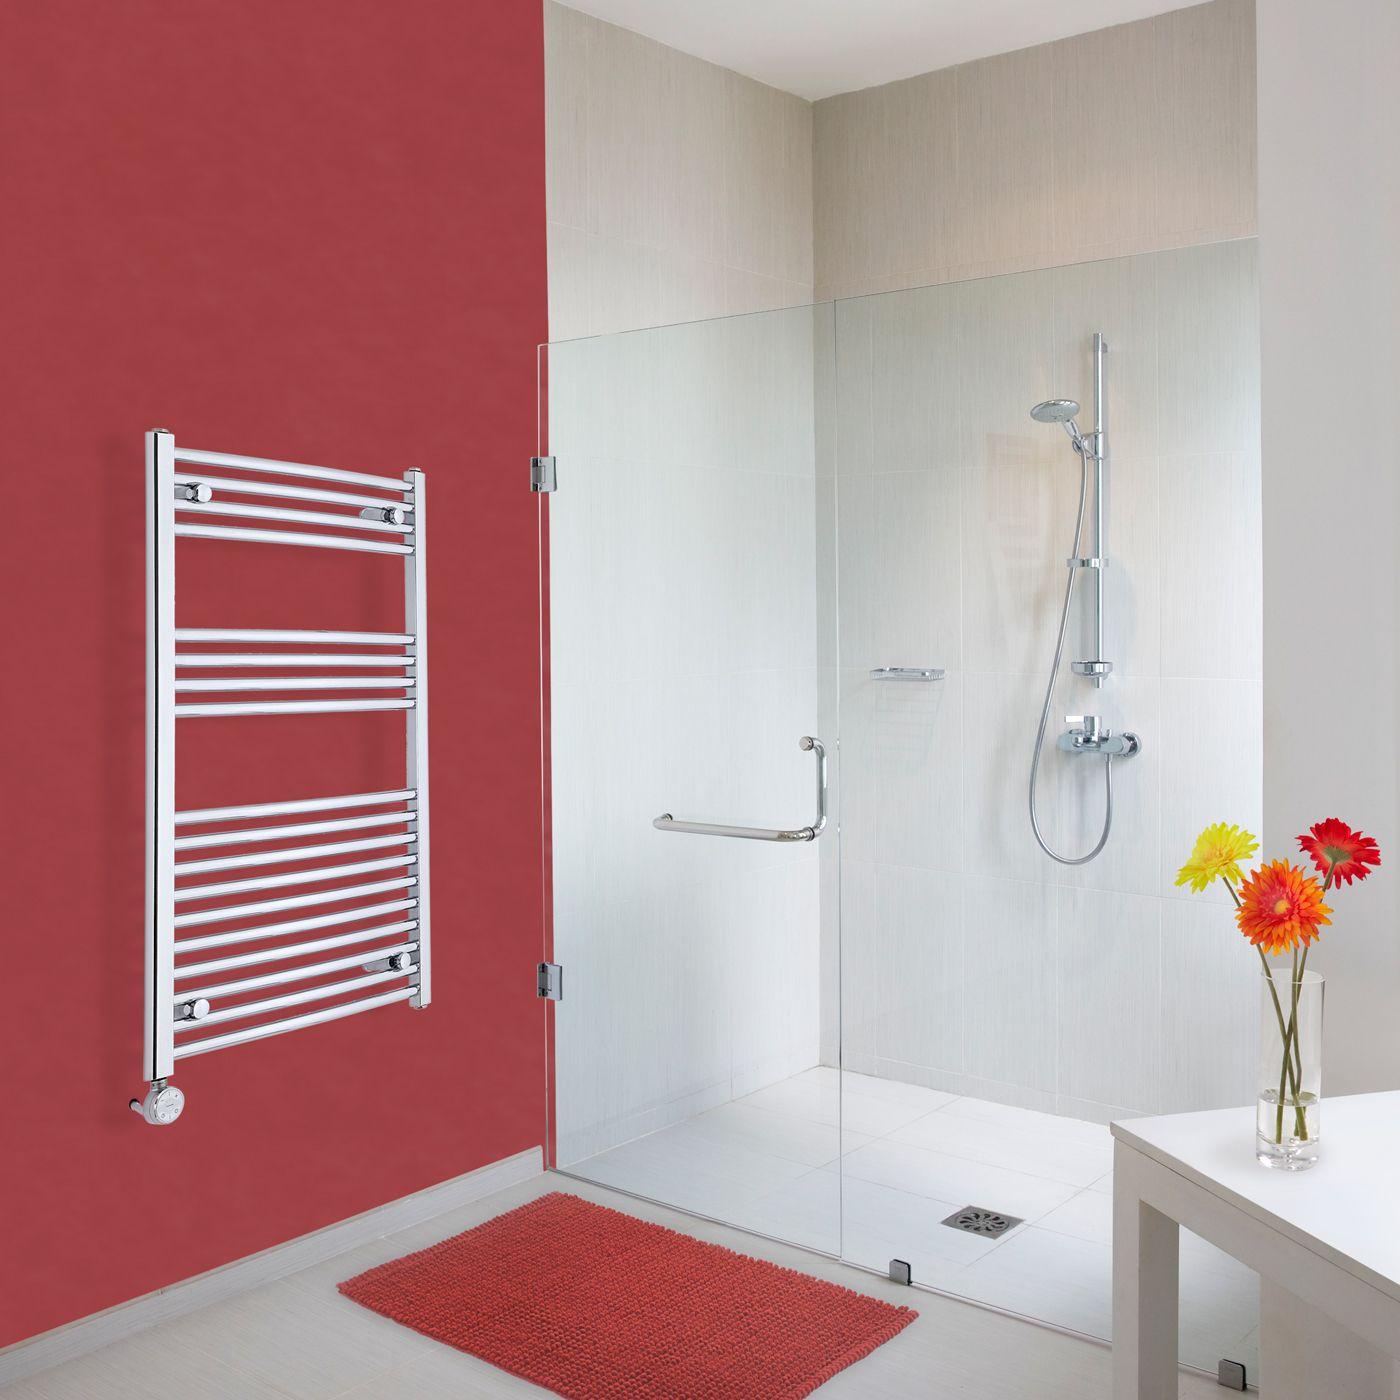 elektrischer handtuchheizk rper gebogen chrom 1000mm x. Black Bedroom Furniture Sets. Home Design Ideas